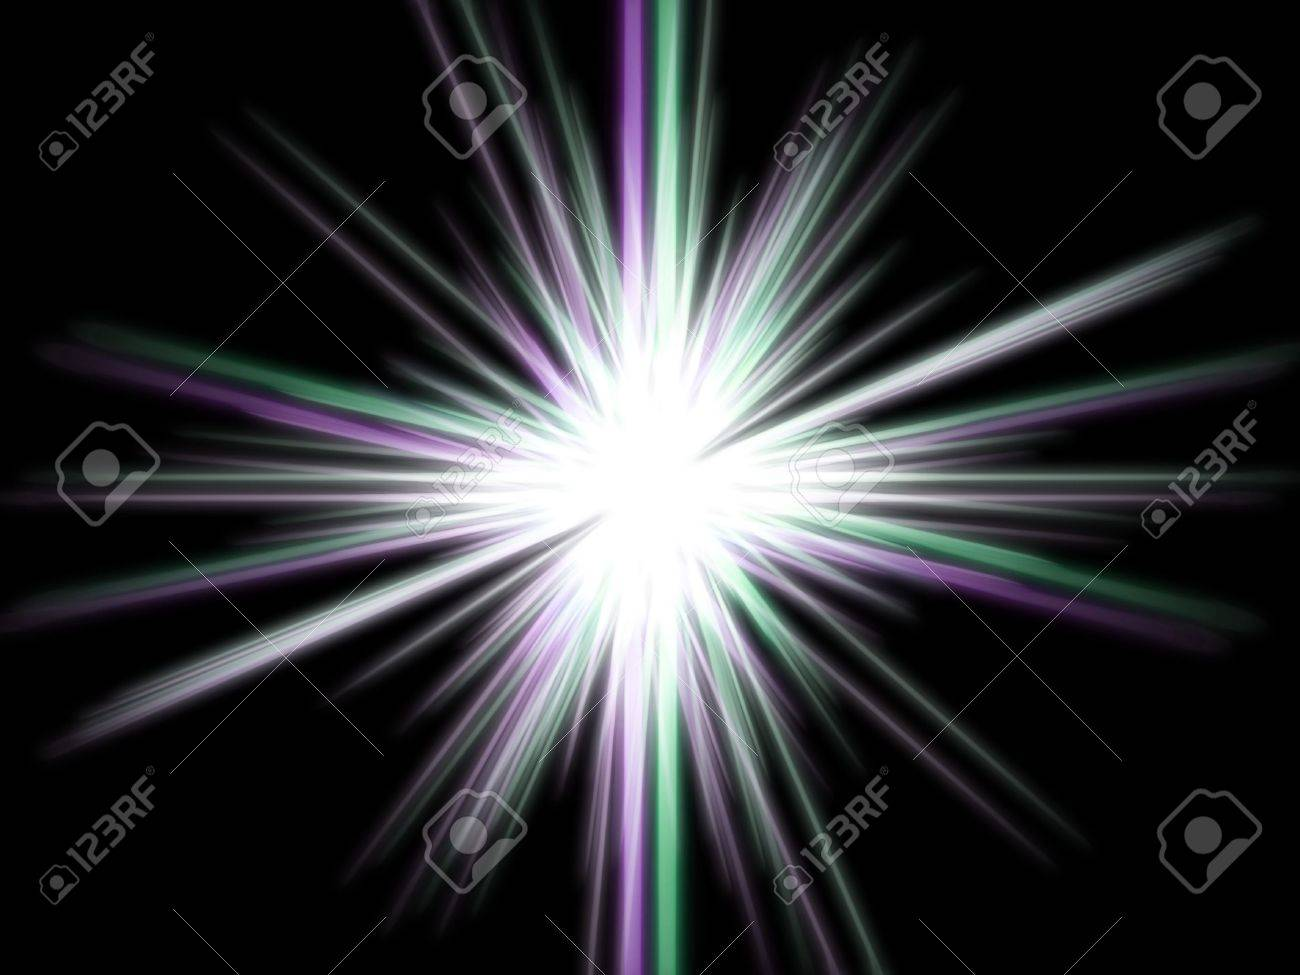 Violet star on a black background. Stock Photo - 3607040